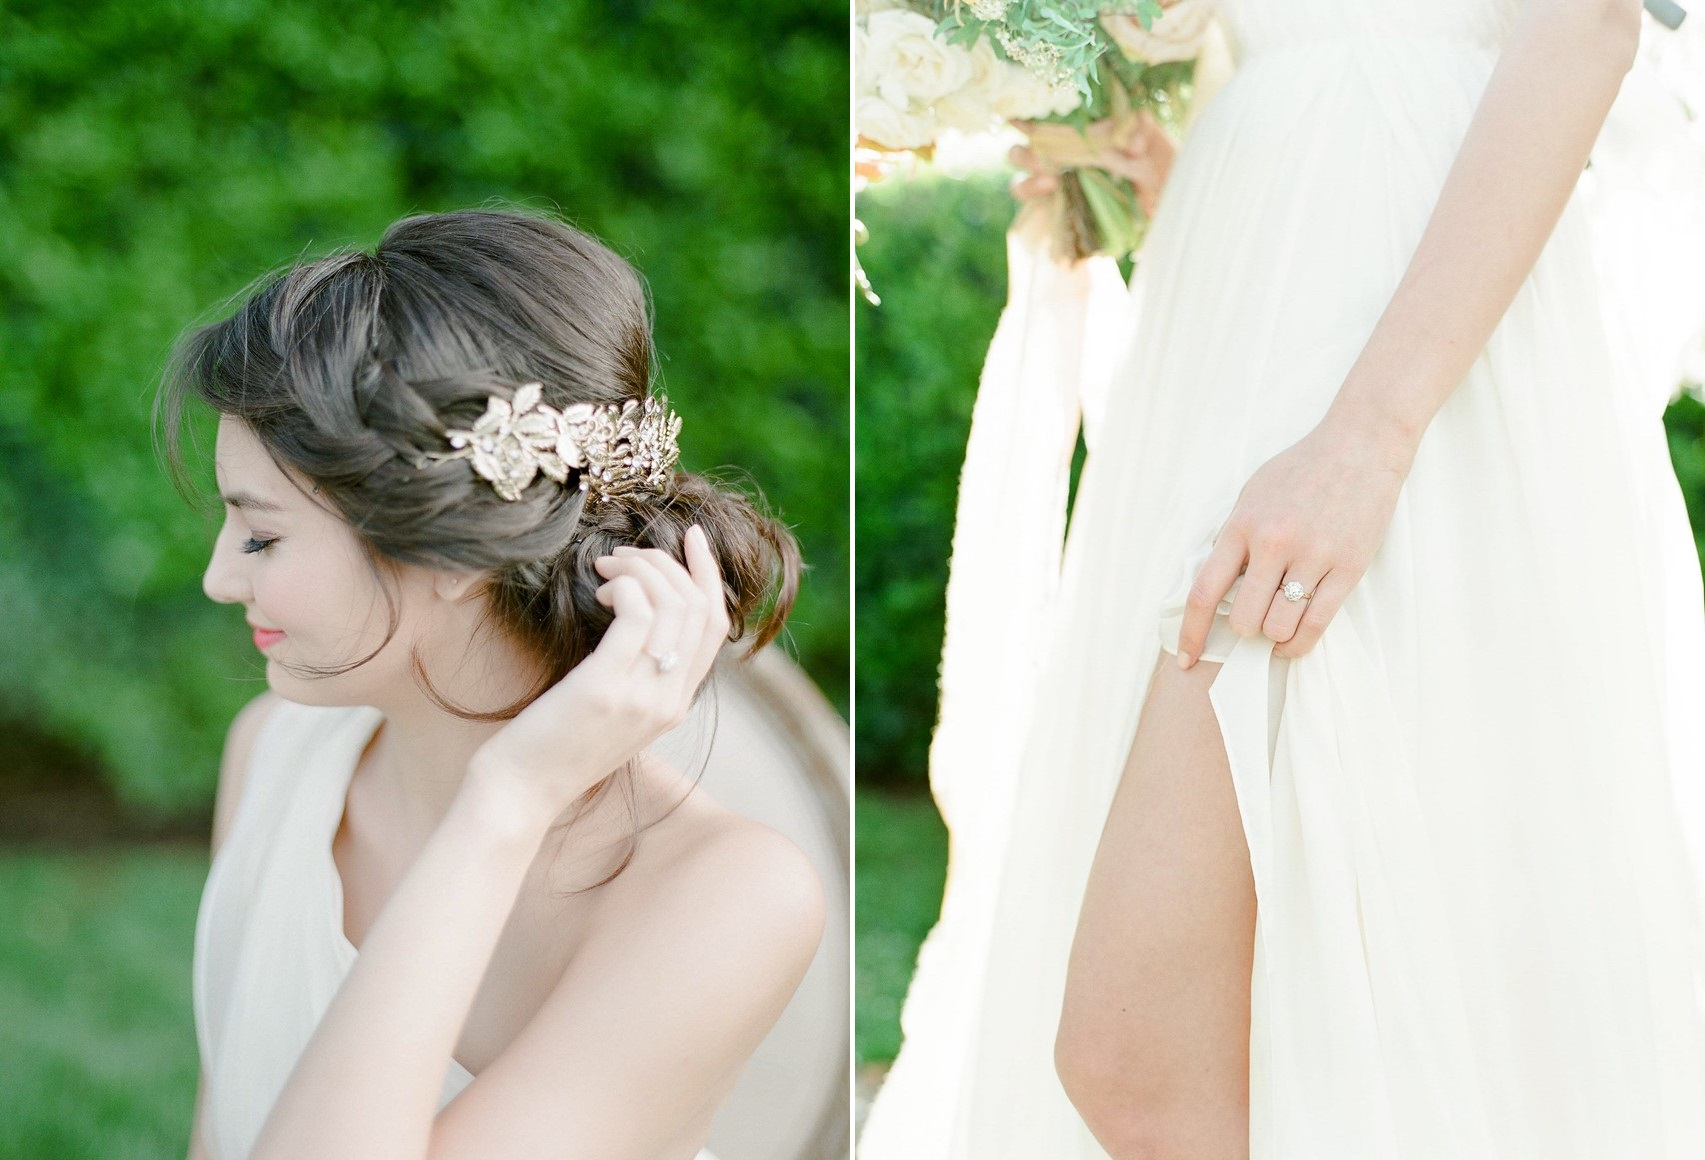 Modern Vintage Bridal Hair Accessory